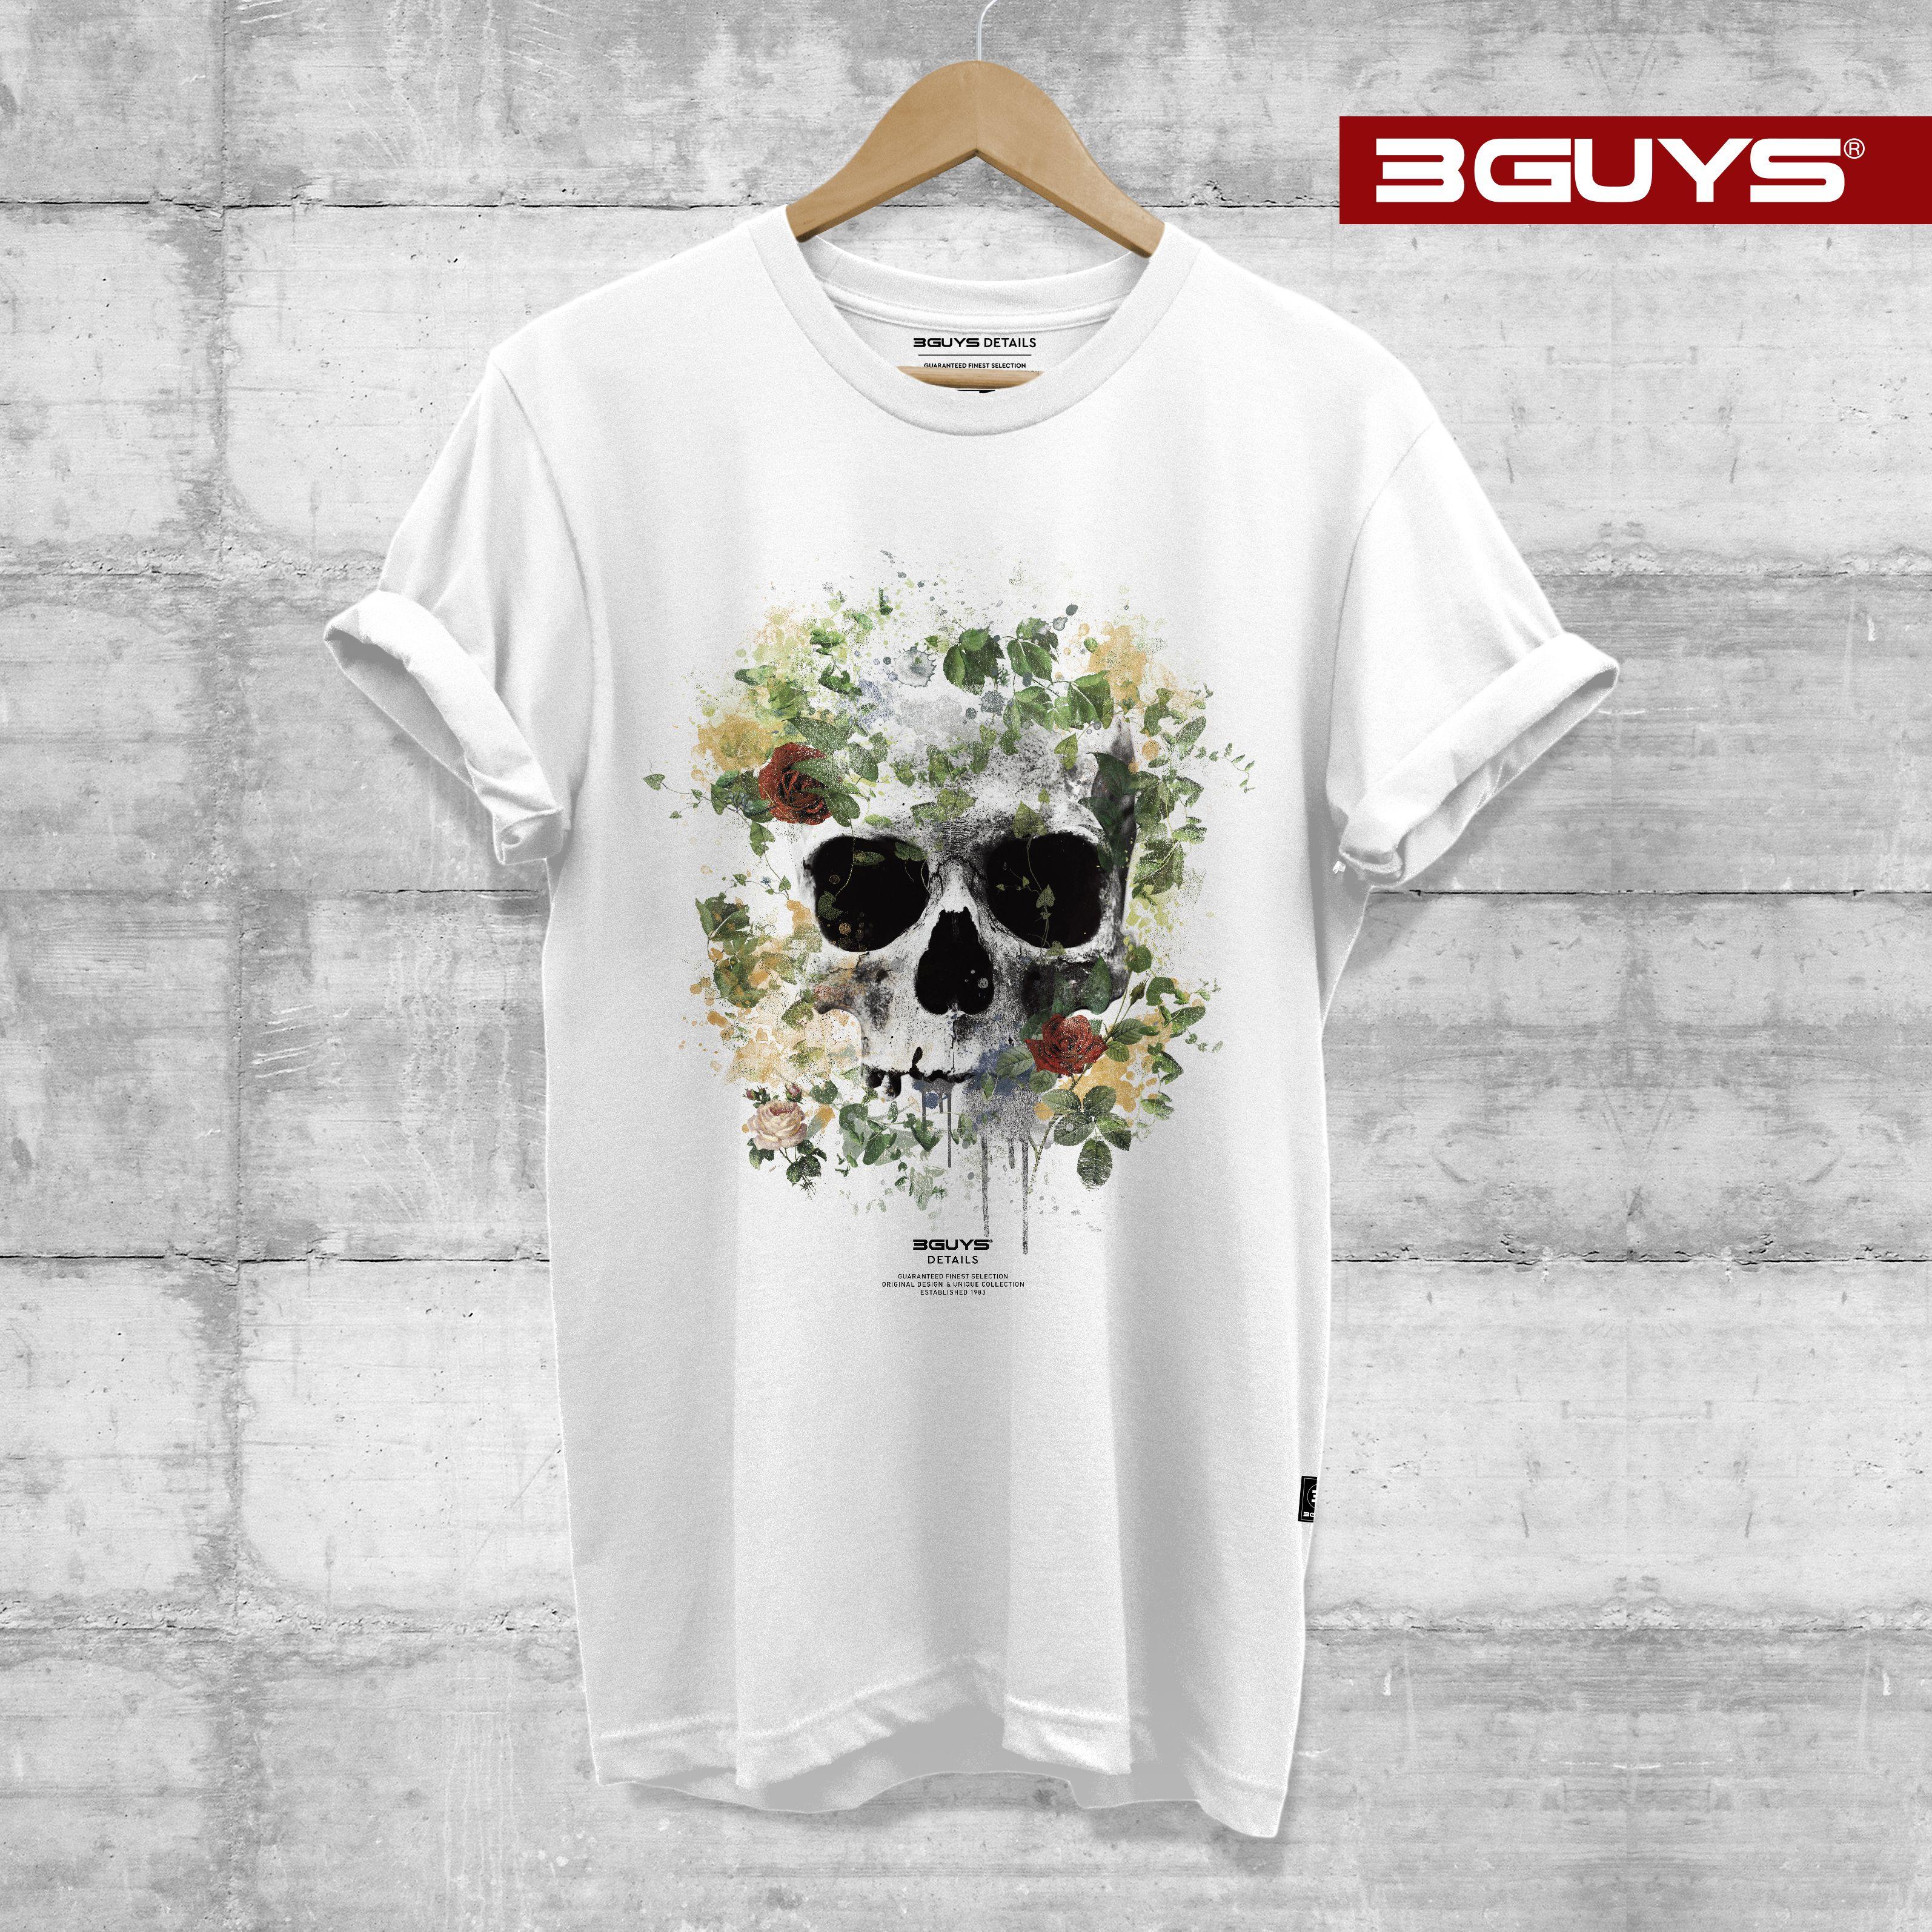 b8e47398d389 ΑΝΔΡΙΚΑ ΜΠΛΟΥΖΑΚΙΑ – T-SHIRTS Τελευταία κομμάτια σε T-shirts μέ 10 ...